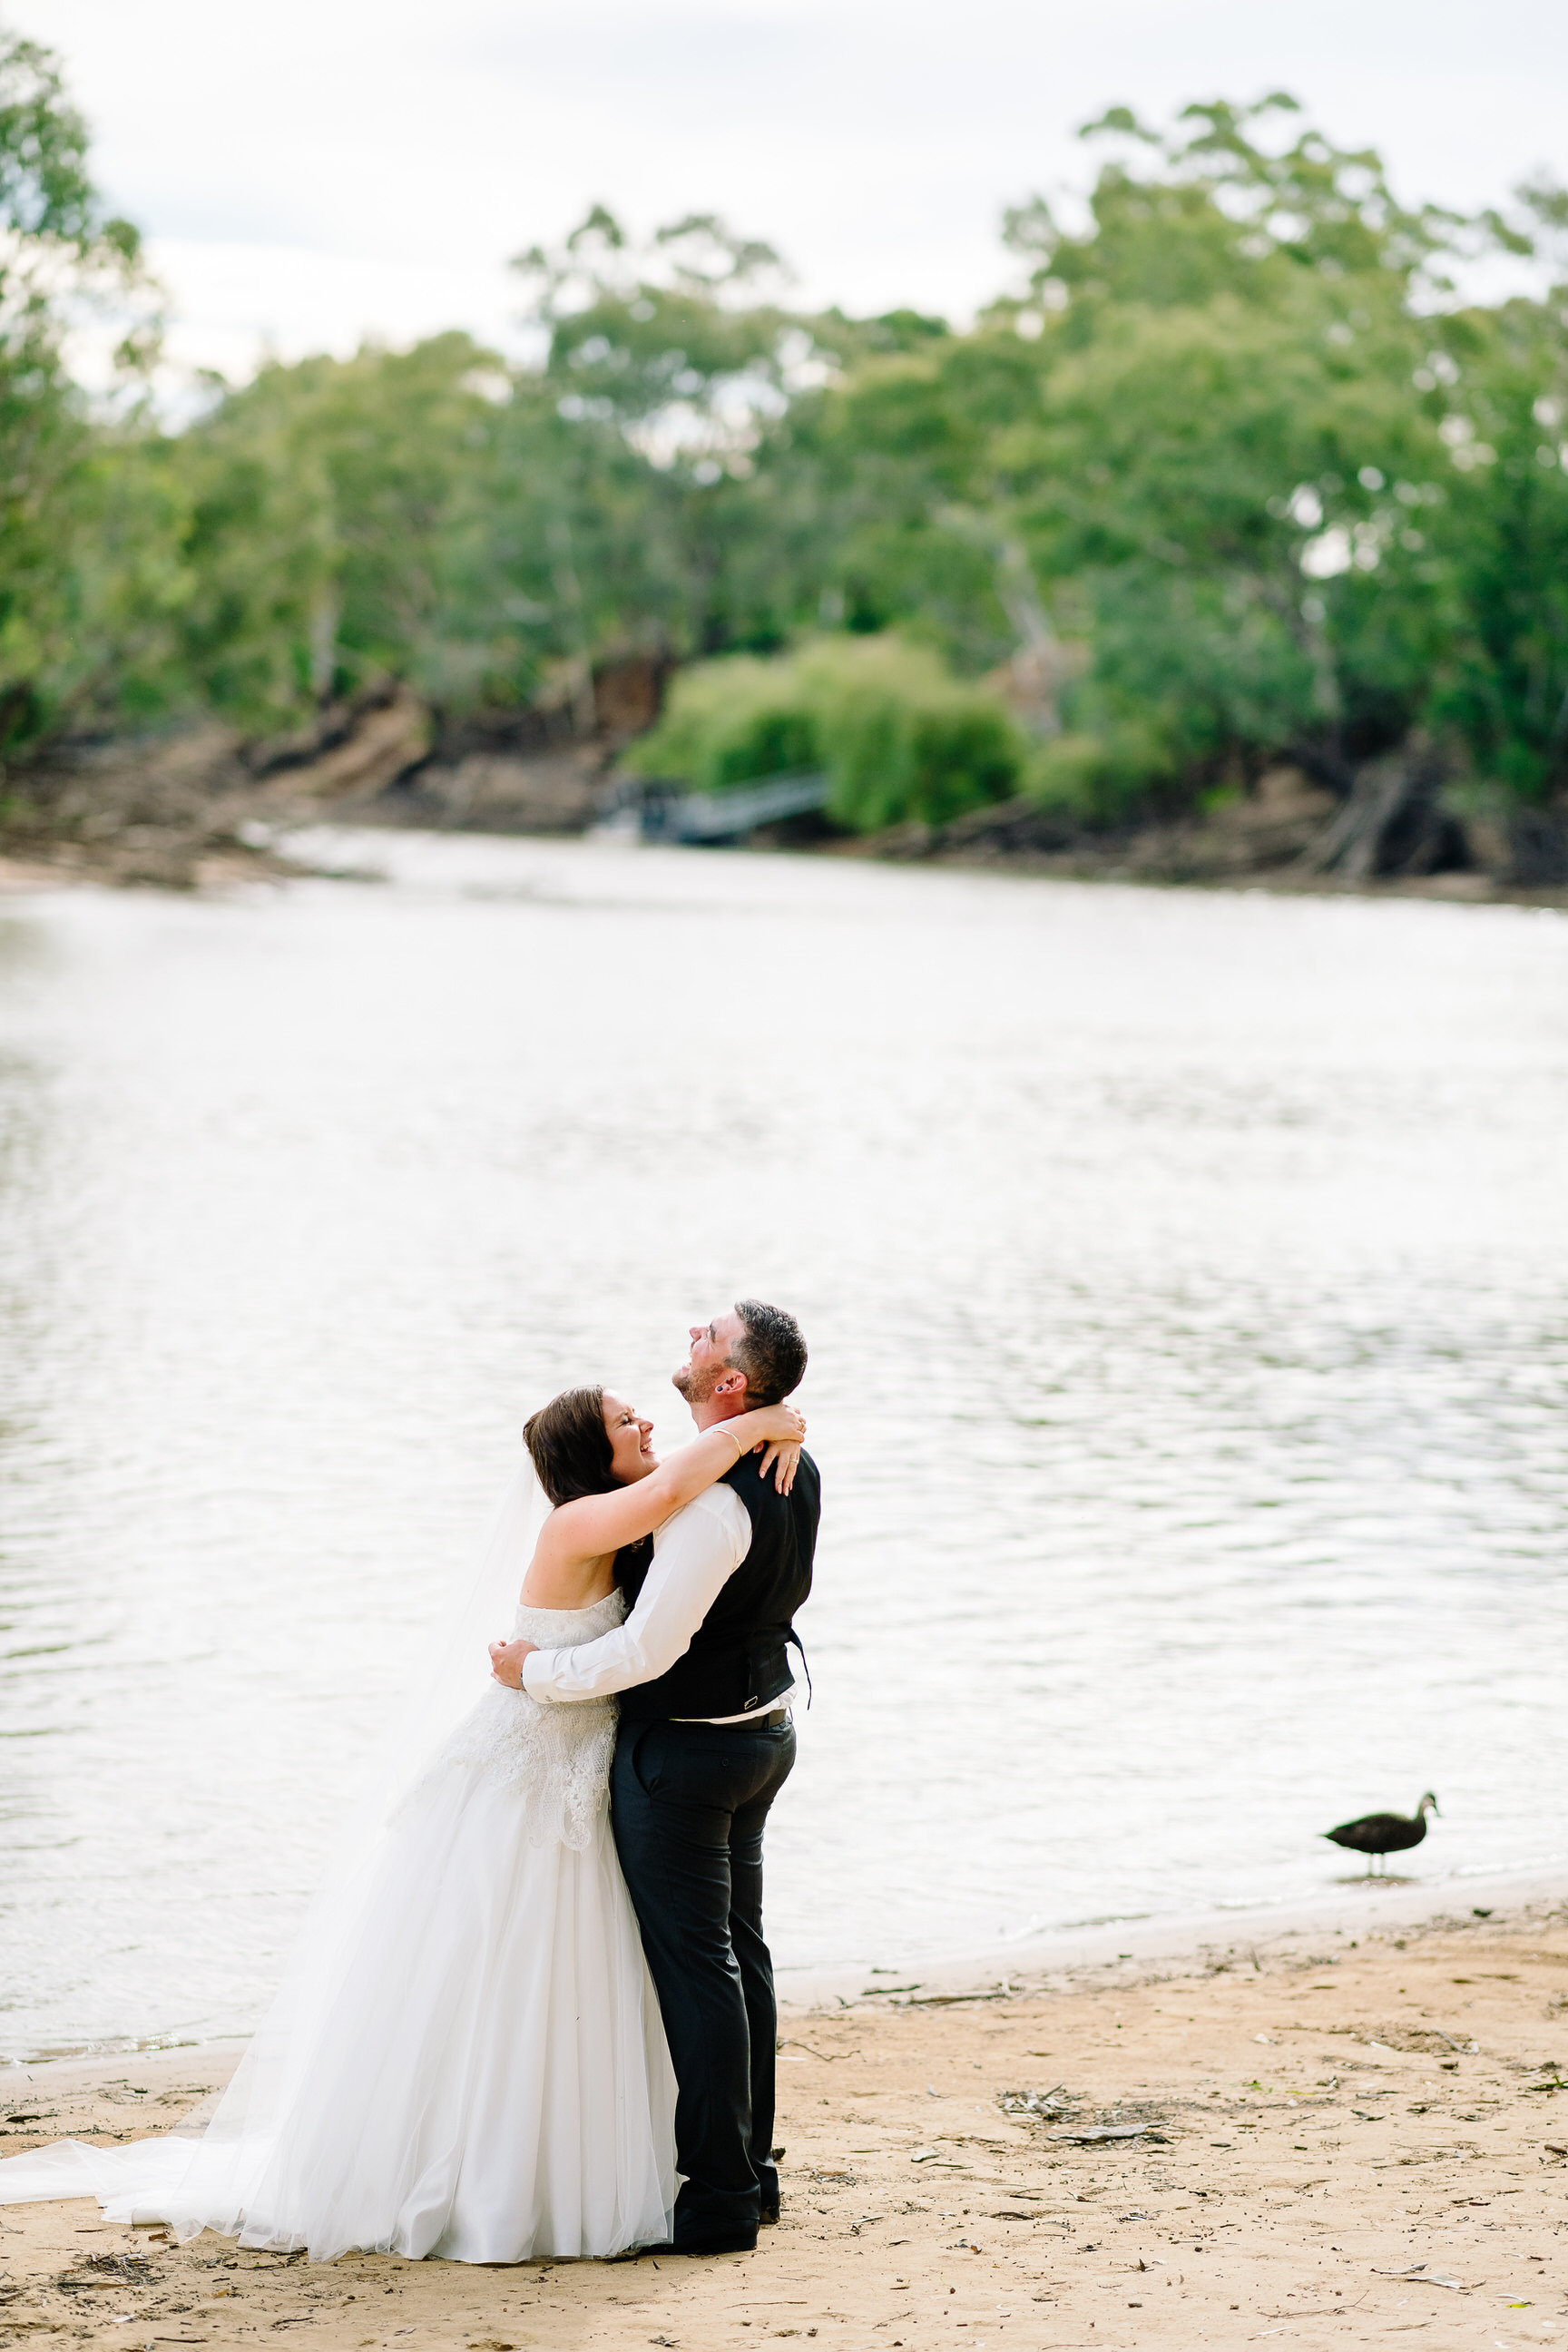 Justin_Jim_Echuca_Wedding_Photography_Tindarra-231.JPG